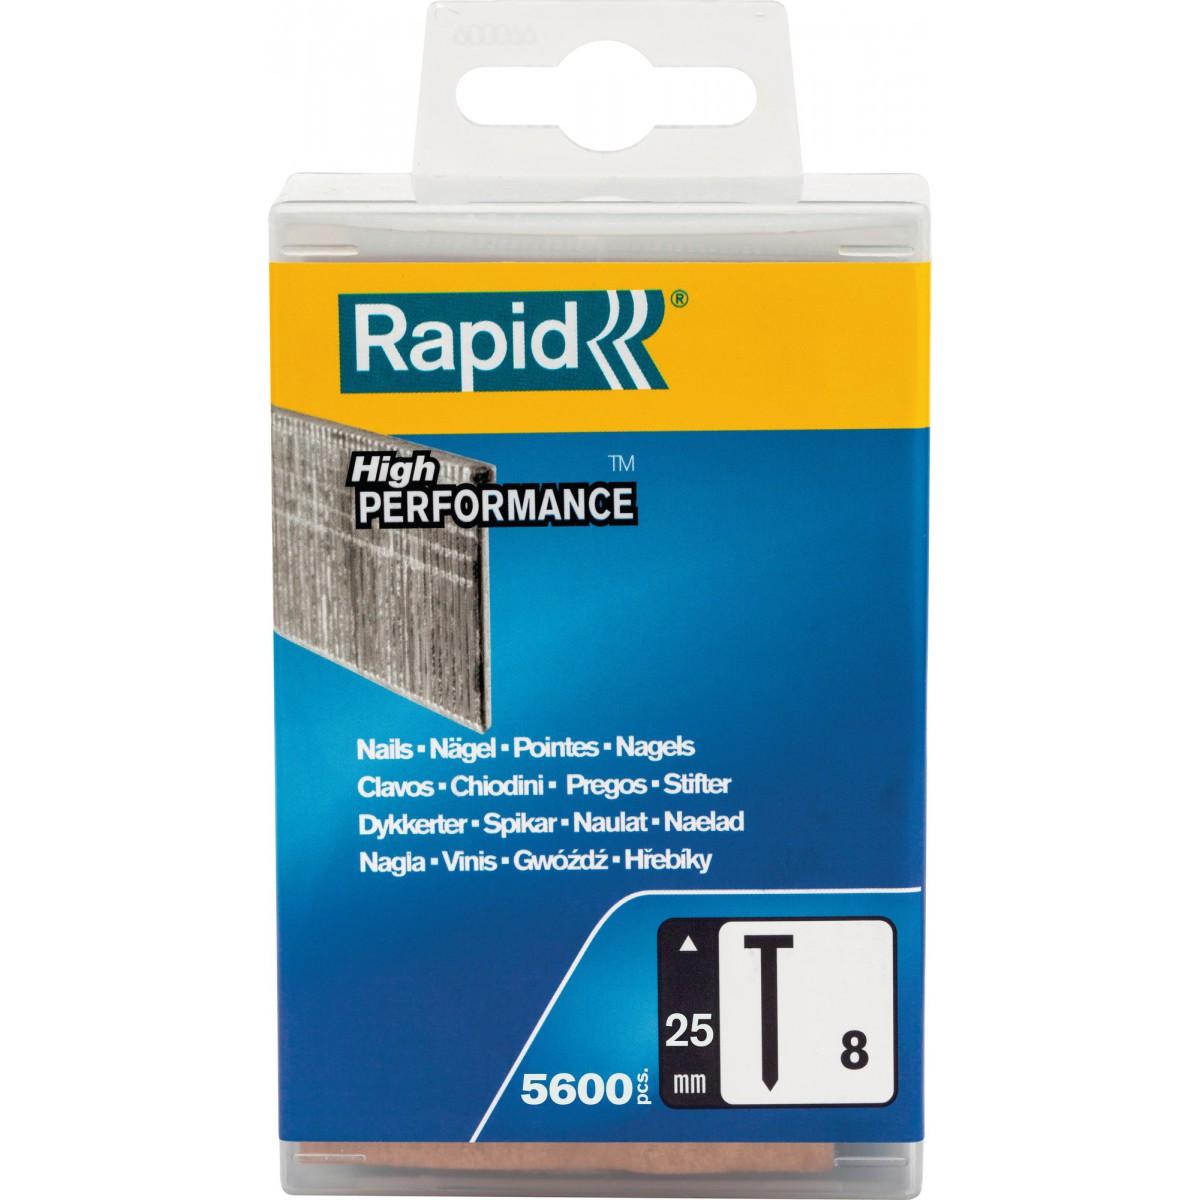 Pointe n°8 Rapid Agraf - Hauteur 25 mm - 5600 pointes